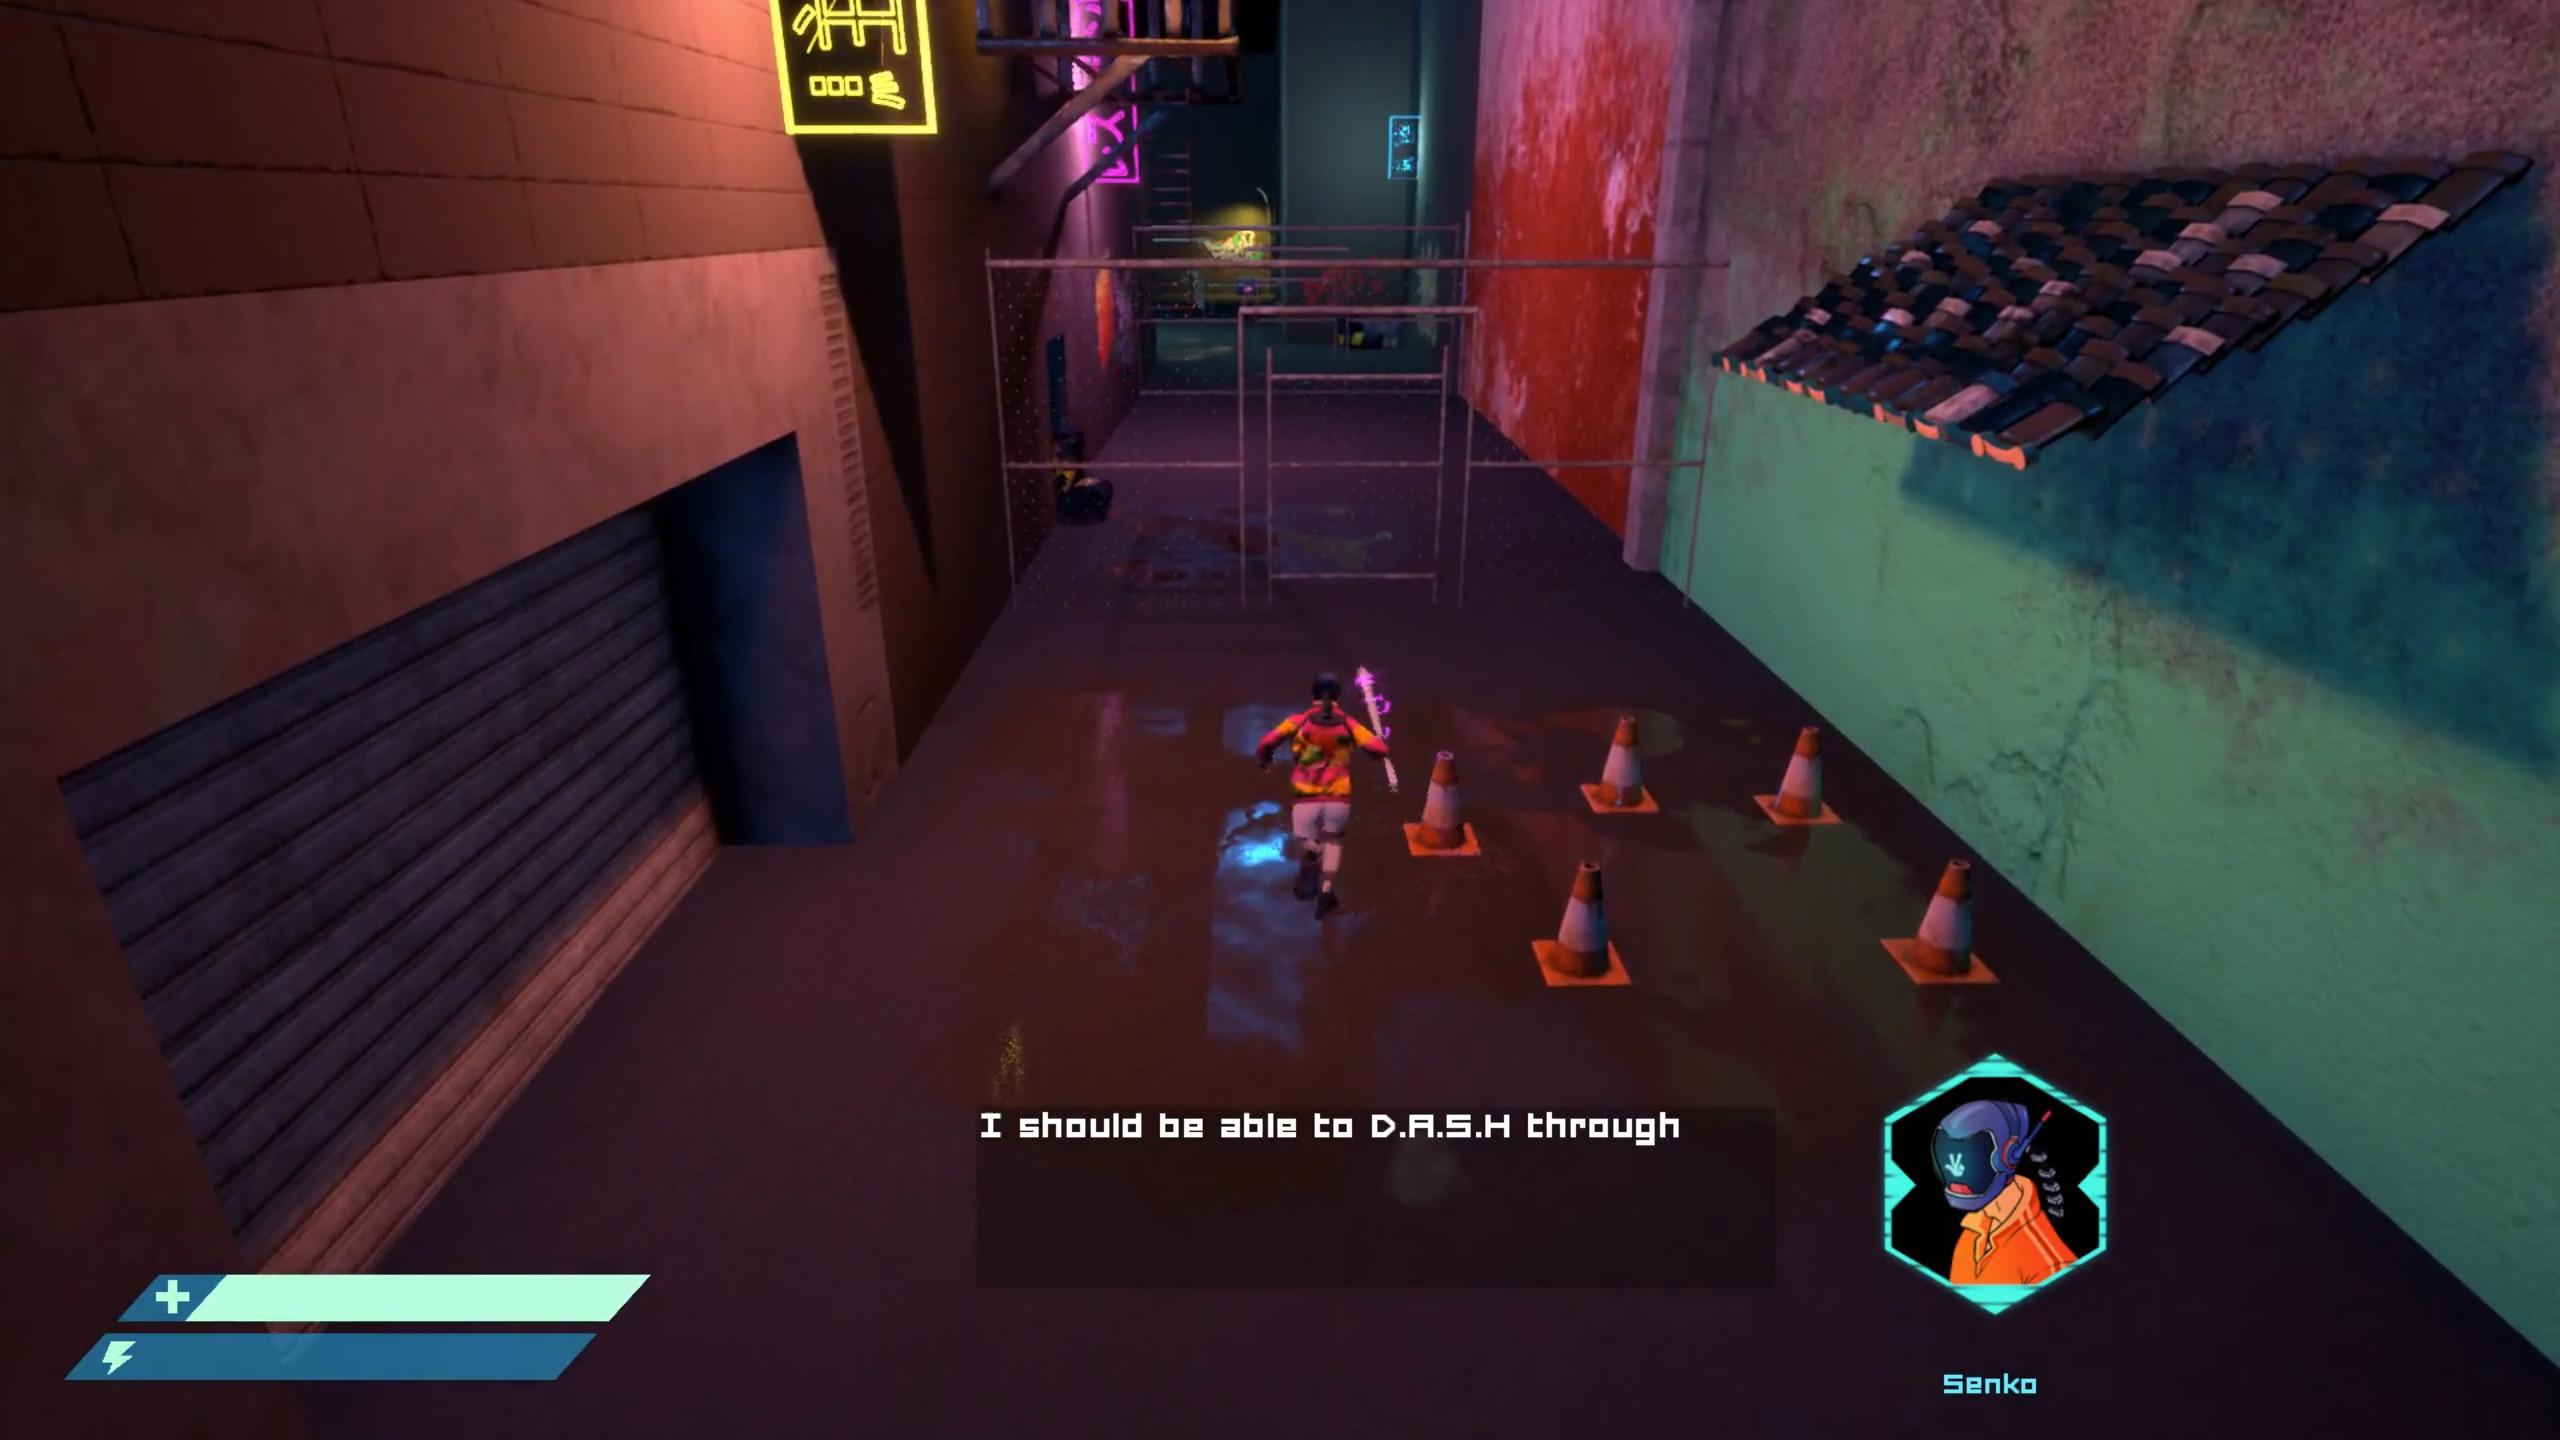 Project Senko screenshot